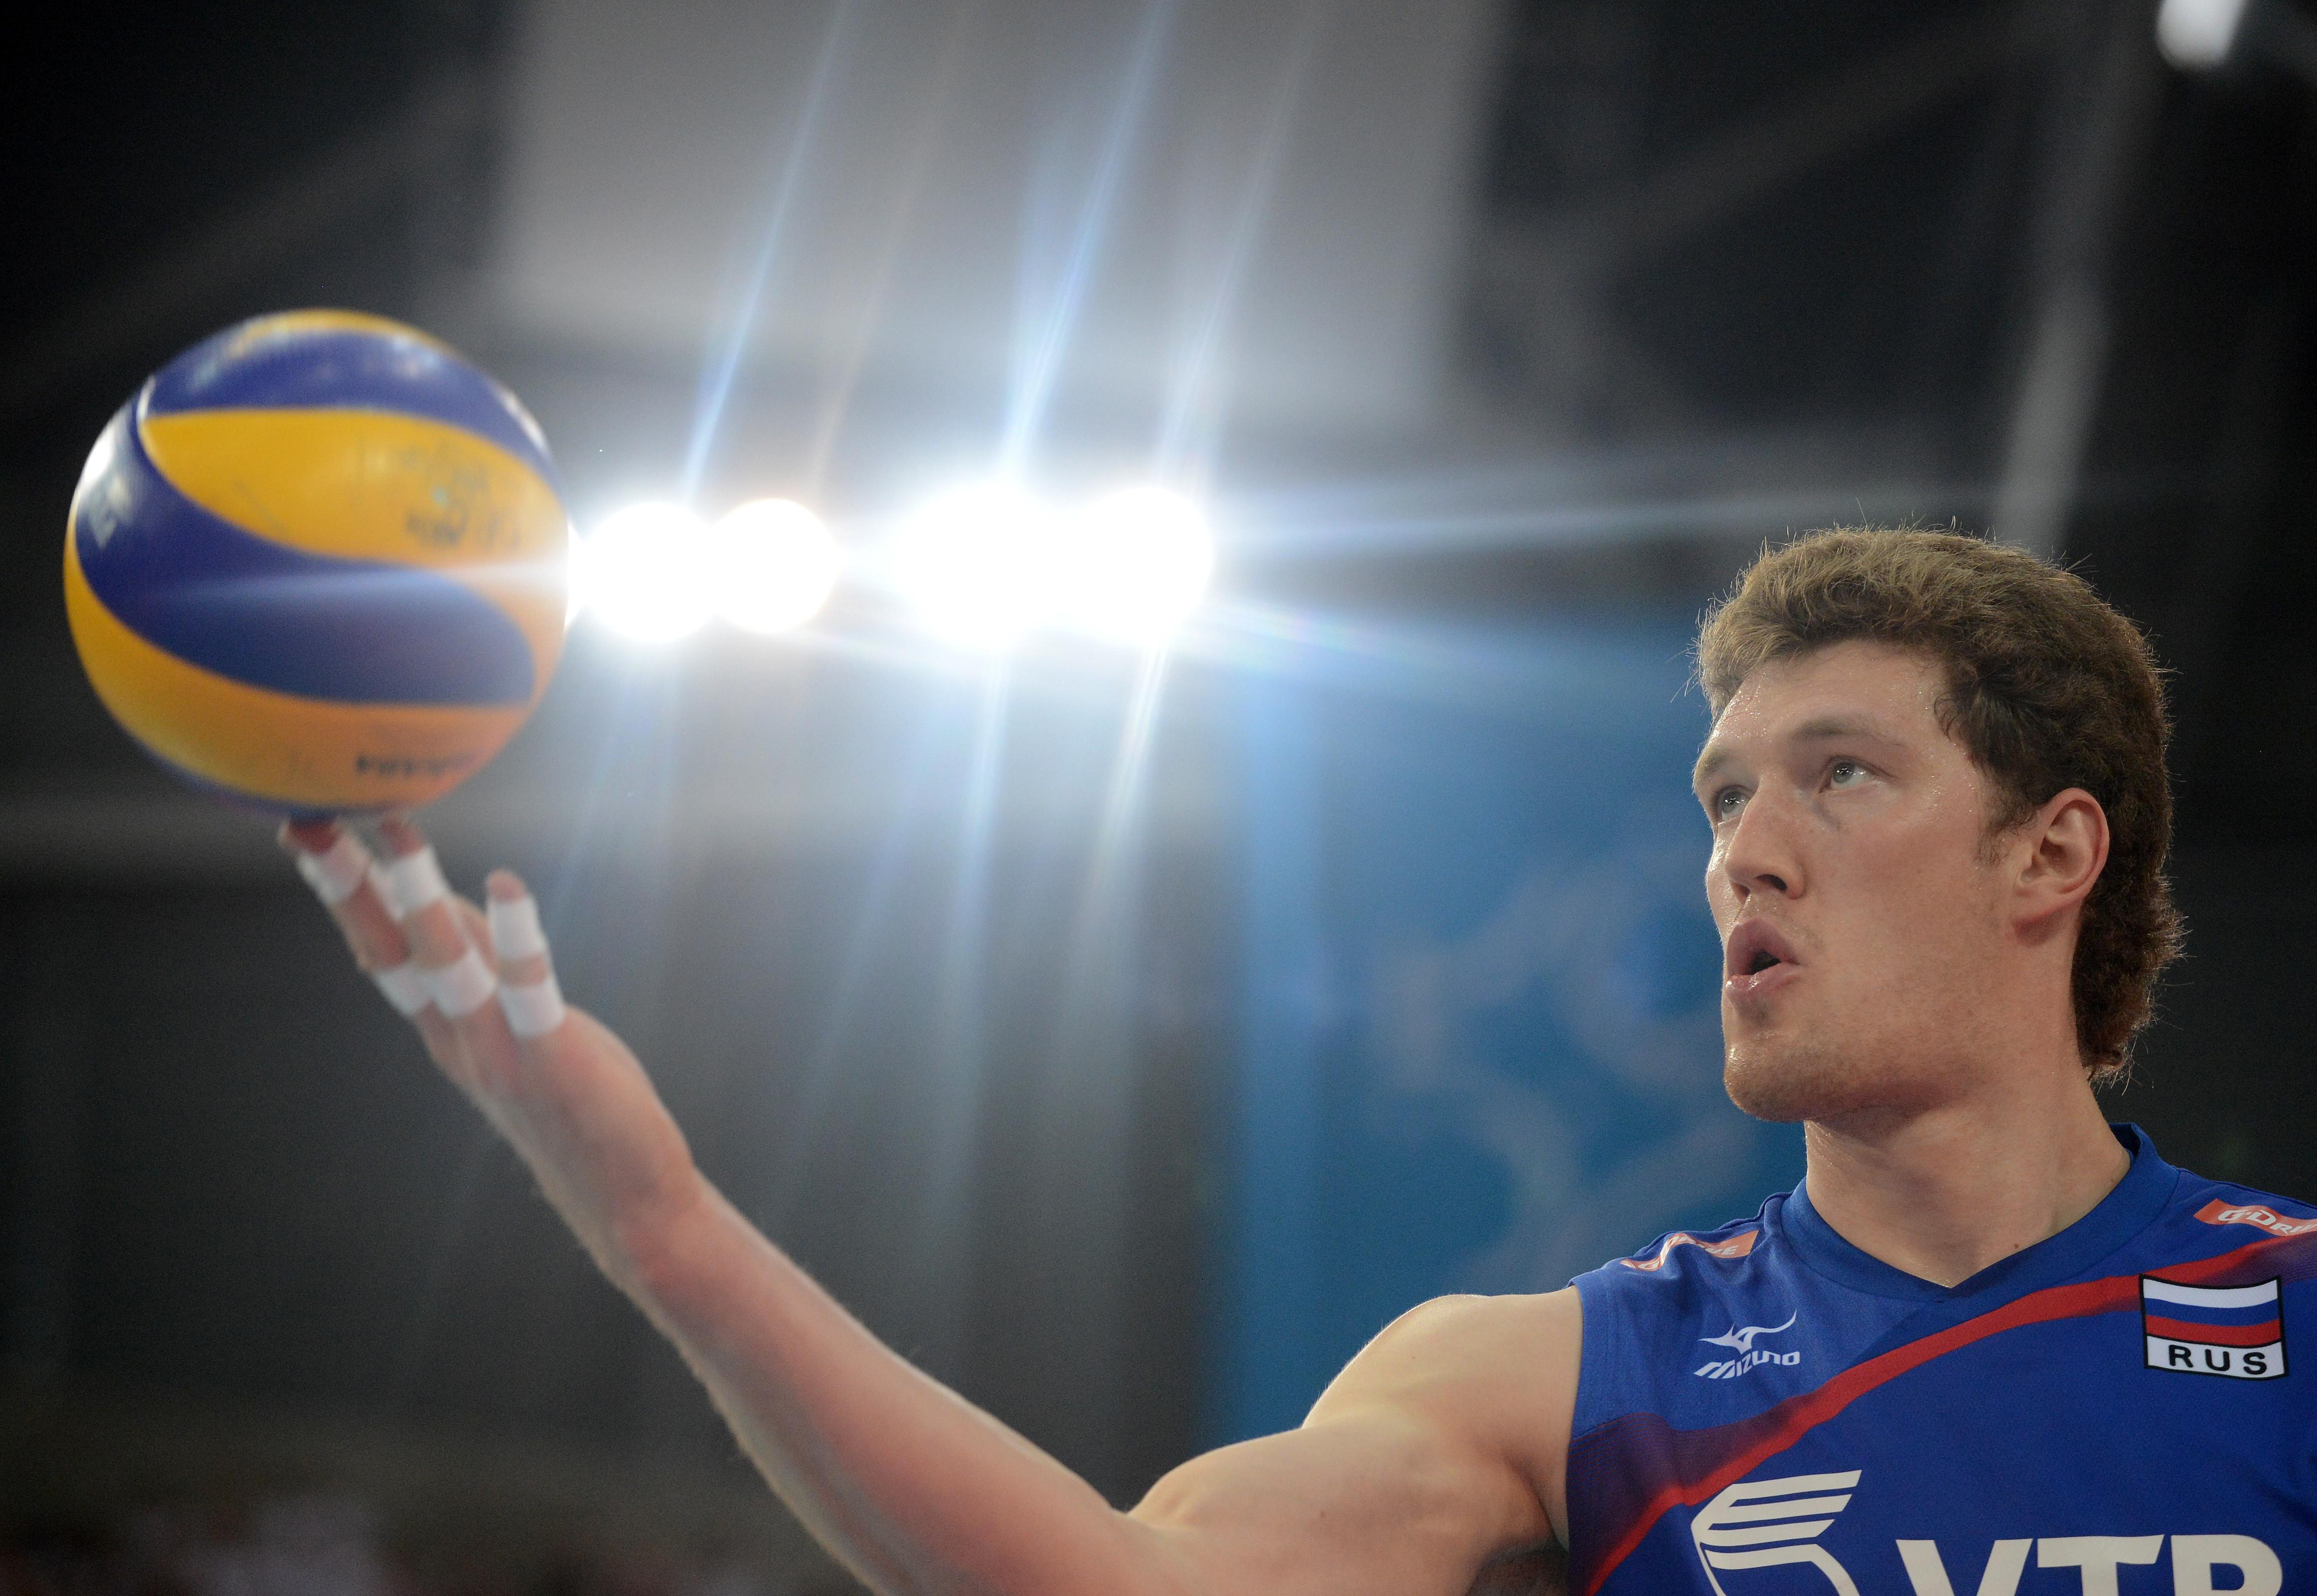 <p>Волейболист Дмитрий Мусэрский. Фото: &copy; РИА Новости/Евгений Биятов</p>